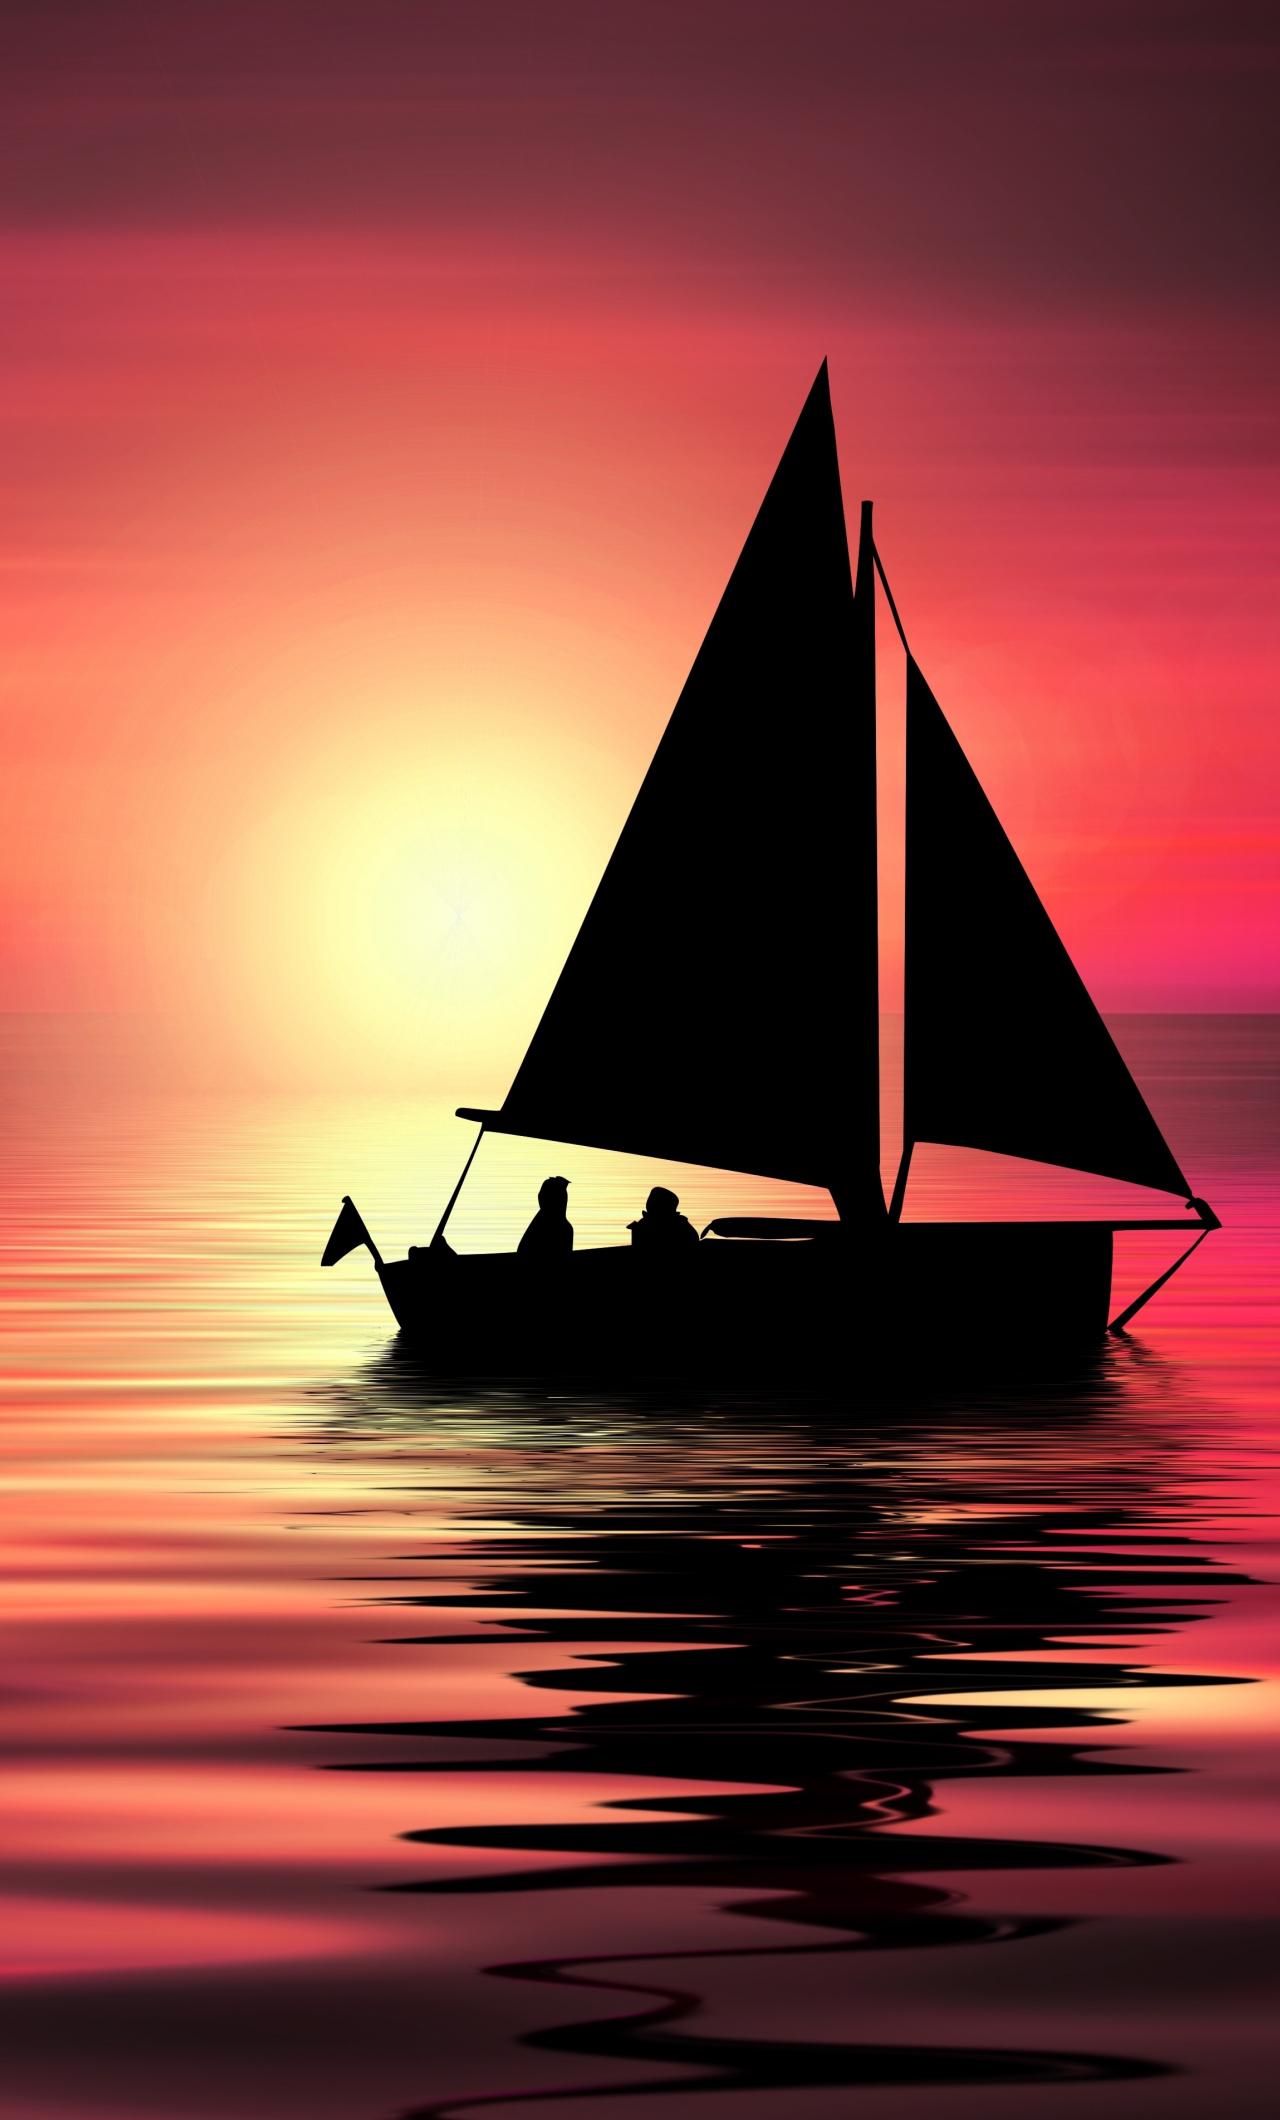 Artwork, sailboat, sunset, silhouette, 1280x2120 wallpaper